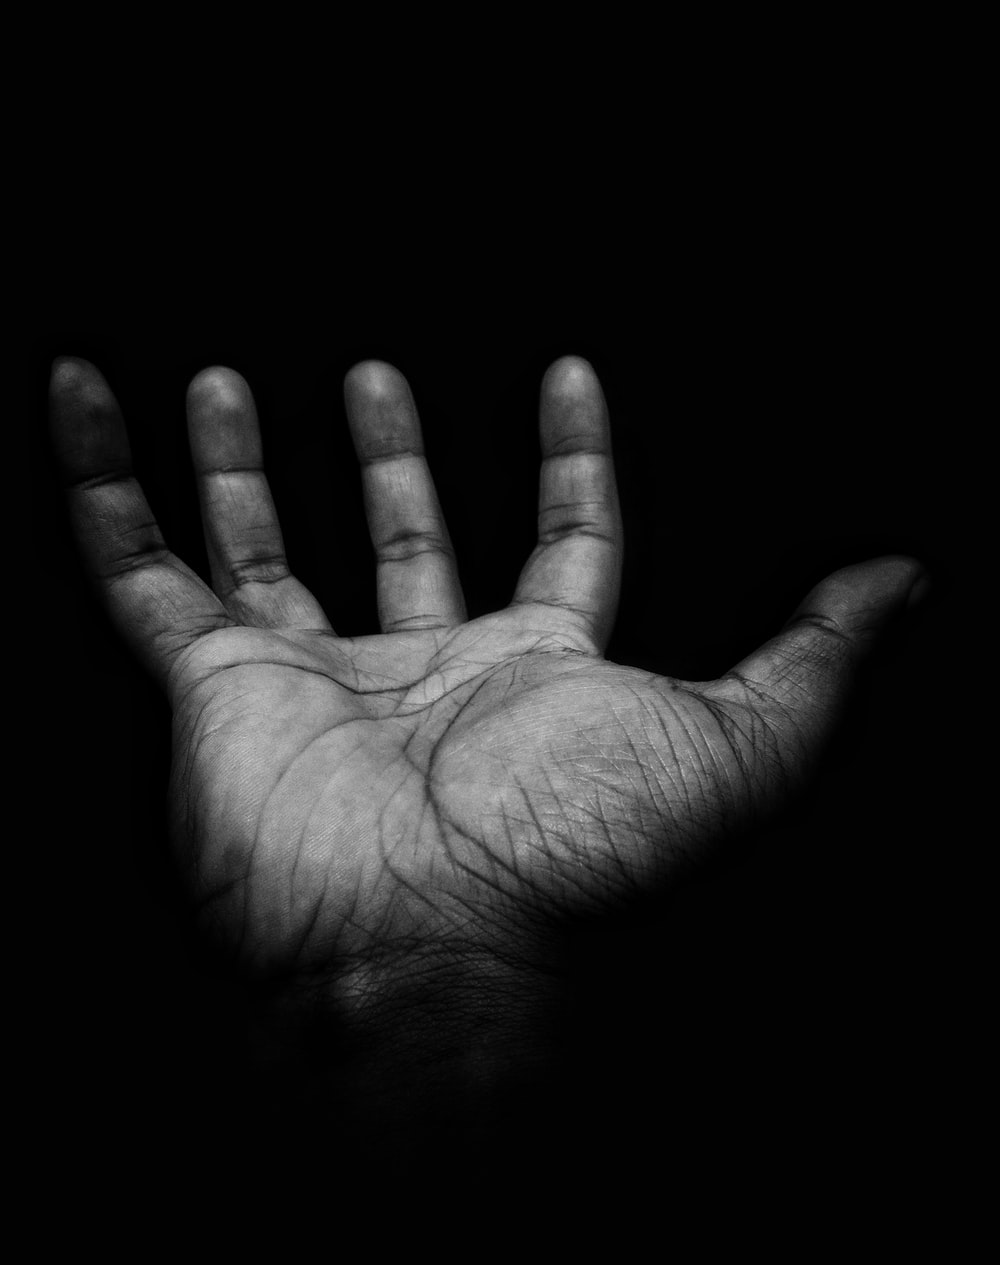 right person's palm